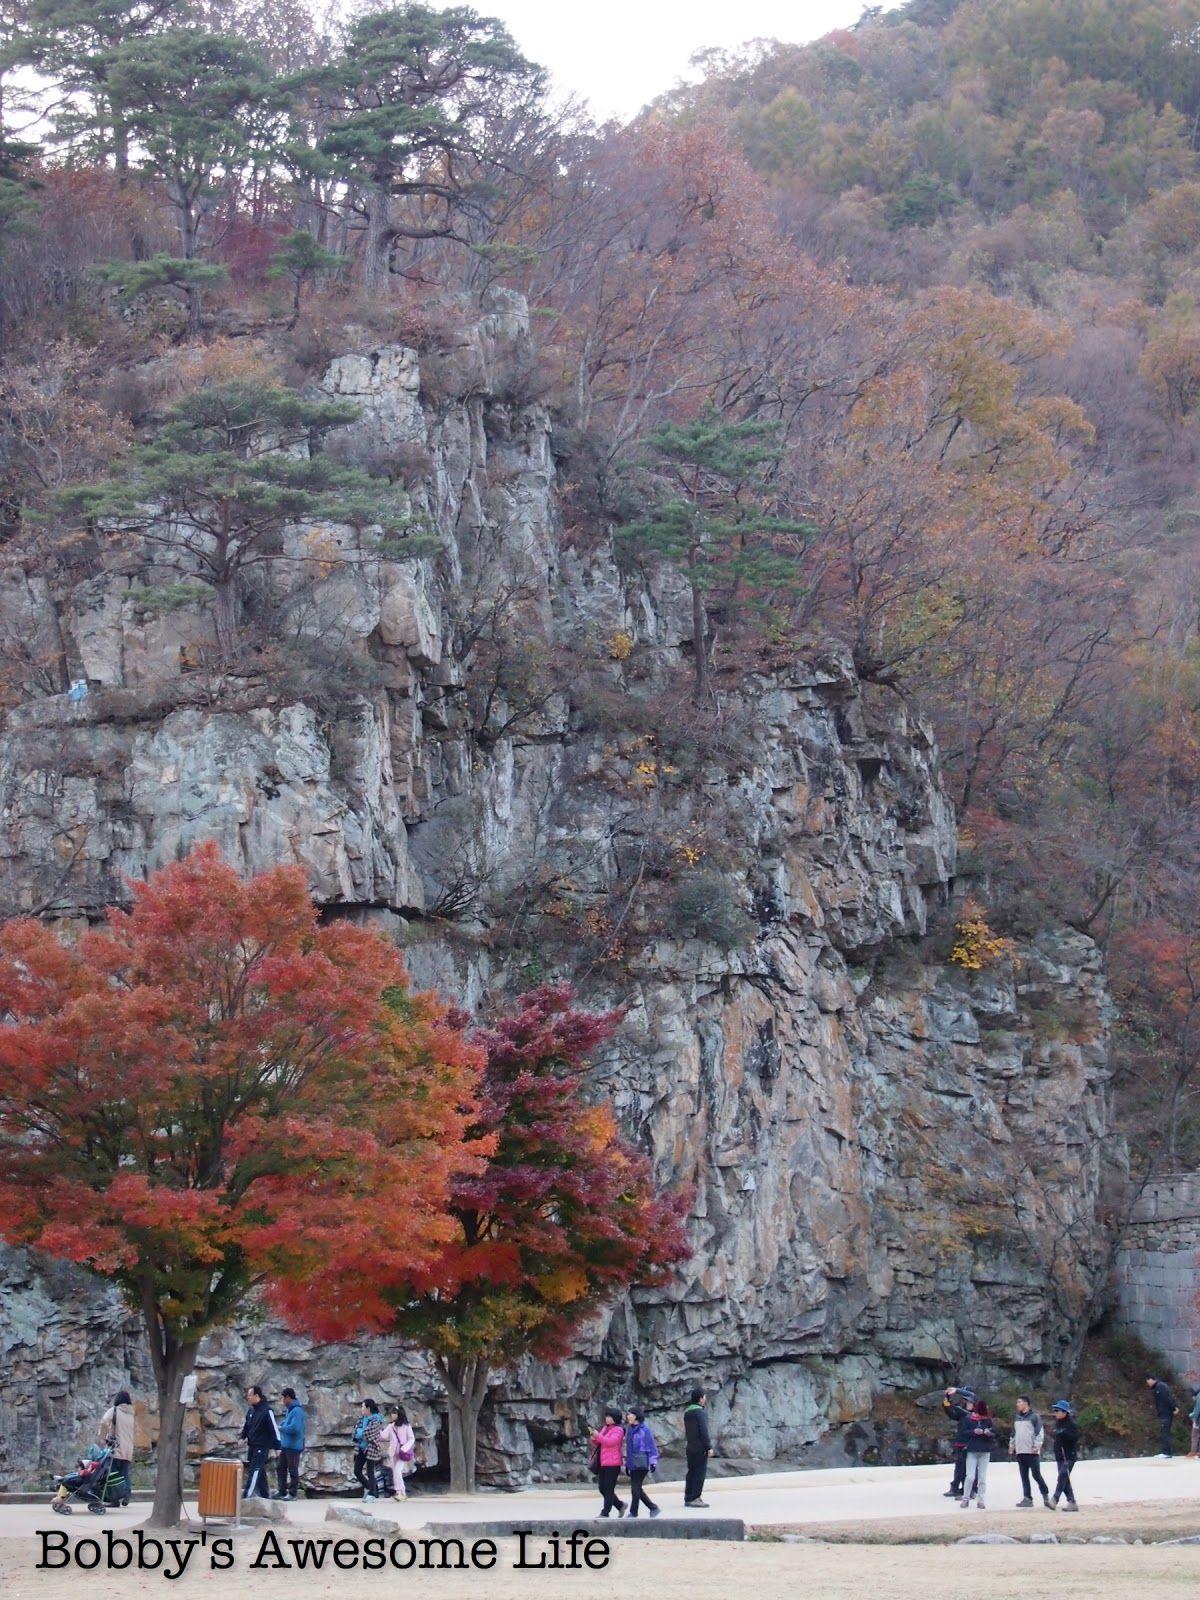 Bobby's Awesome Life: Mungyeong Saejae Provincial Park